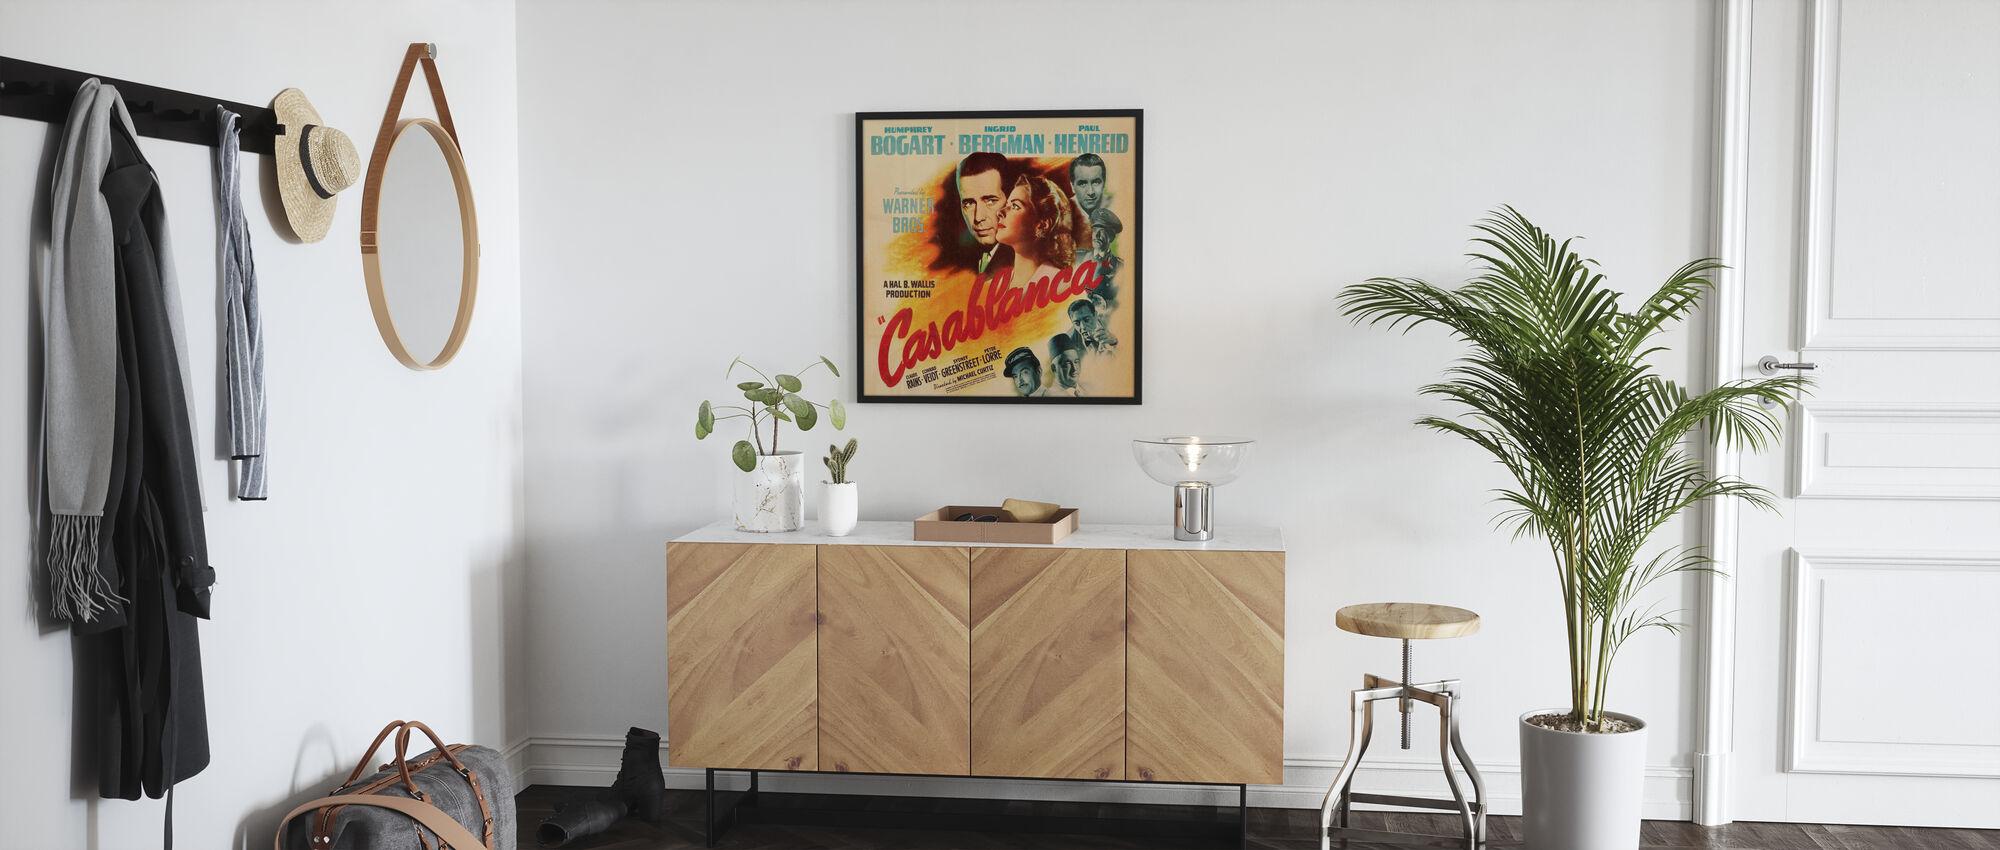 Movie Poster Casablanca - Poster - Hallway